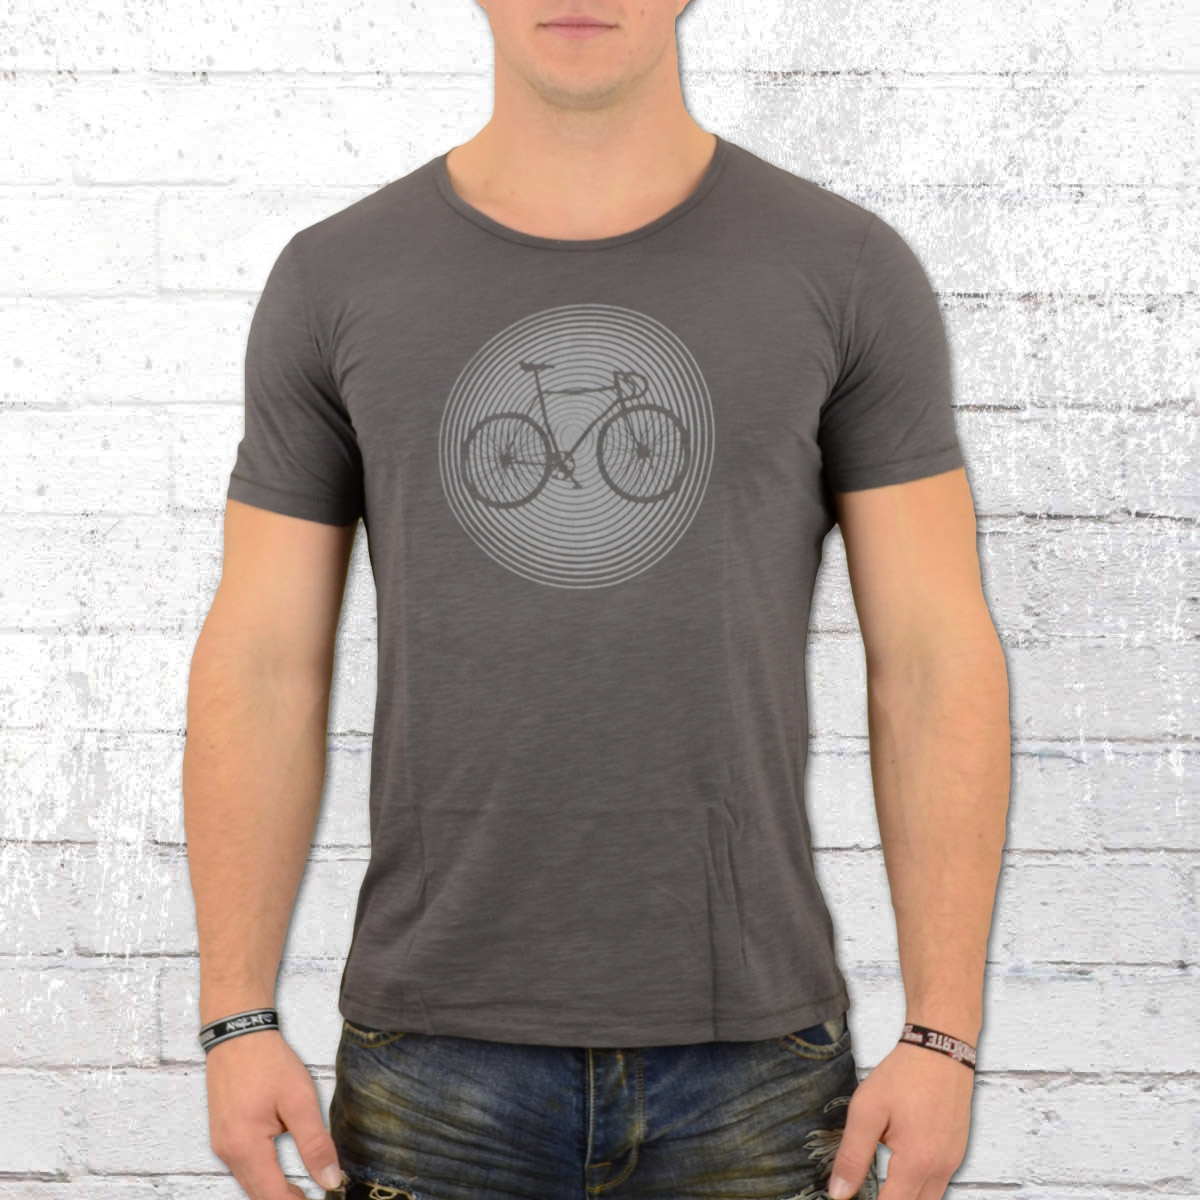 Greenbomb Herren T-Shirt Bike Circle grau